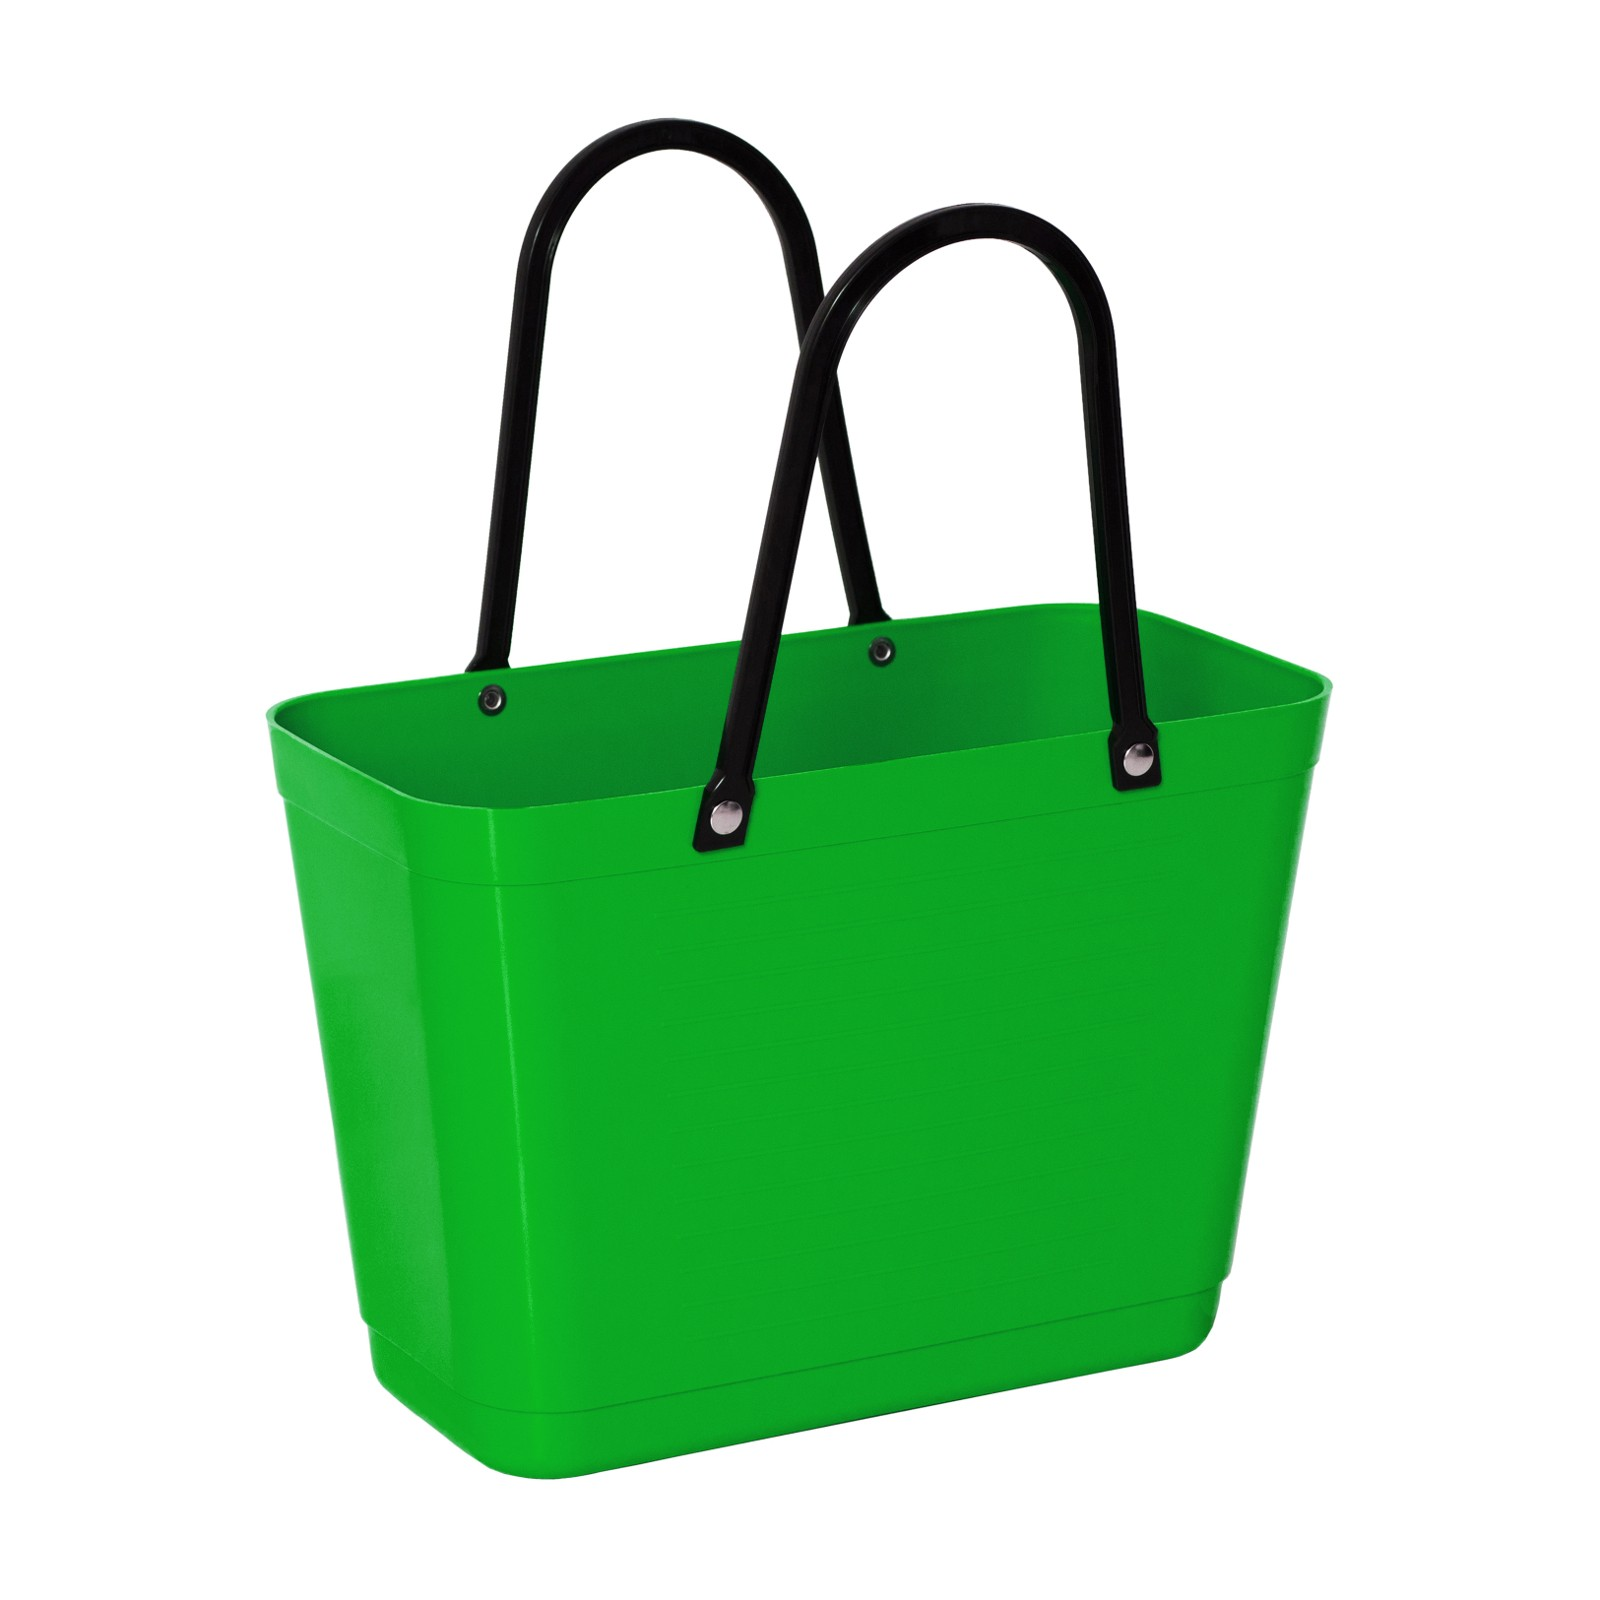 Hinza 250-hinza-bag-small-green-green-plastic